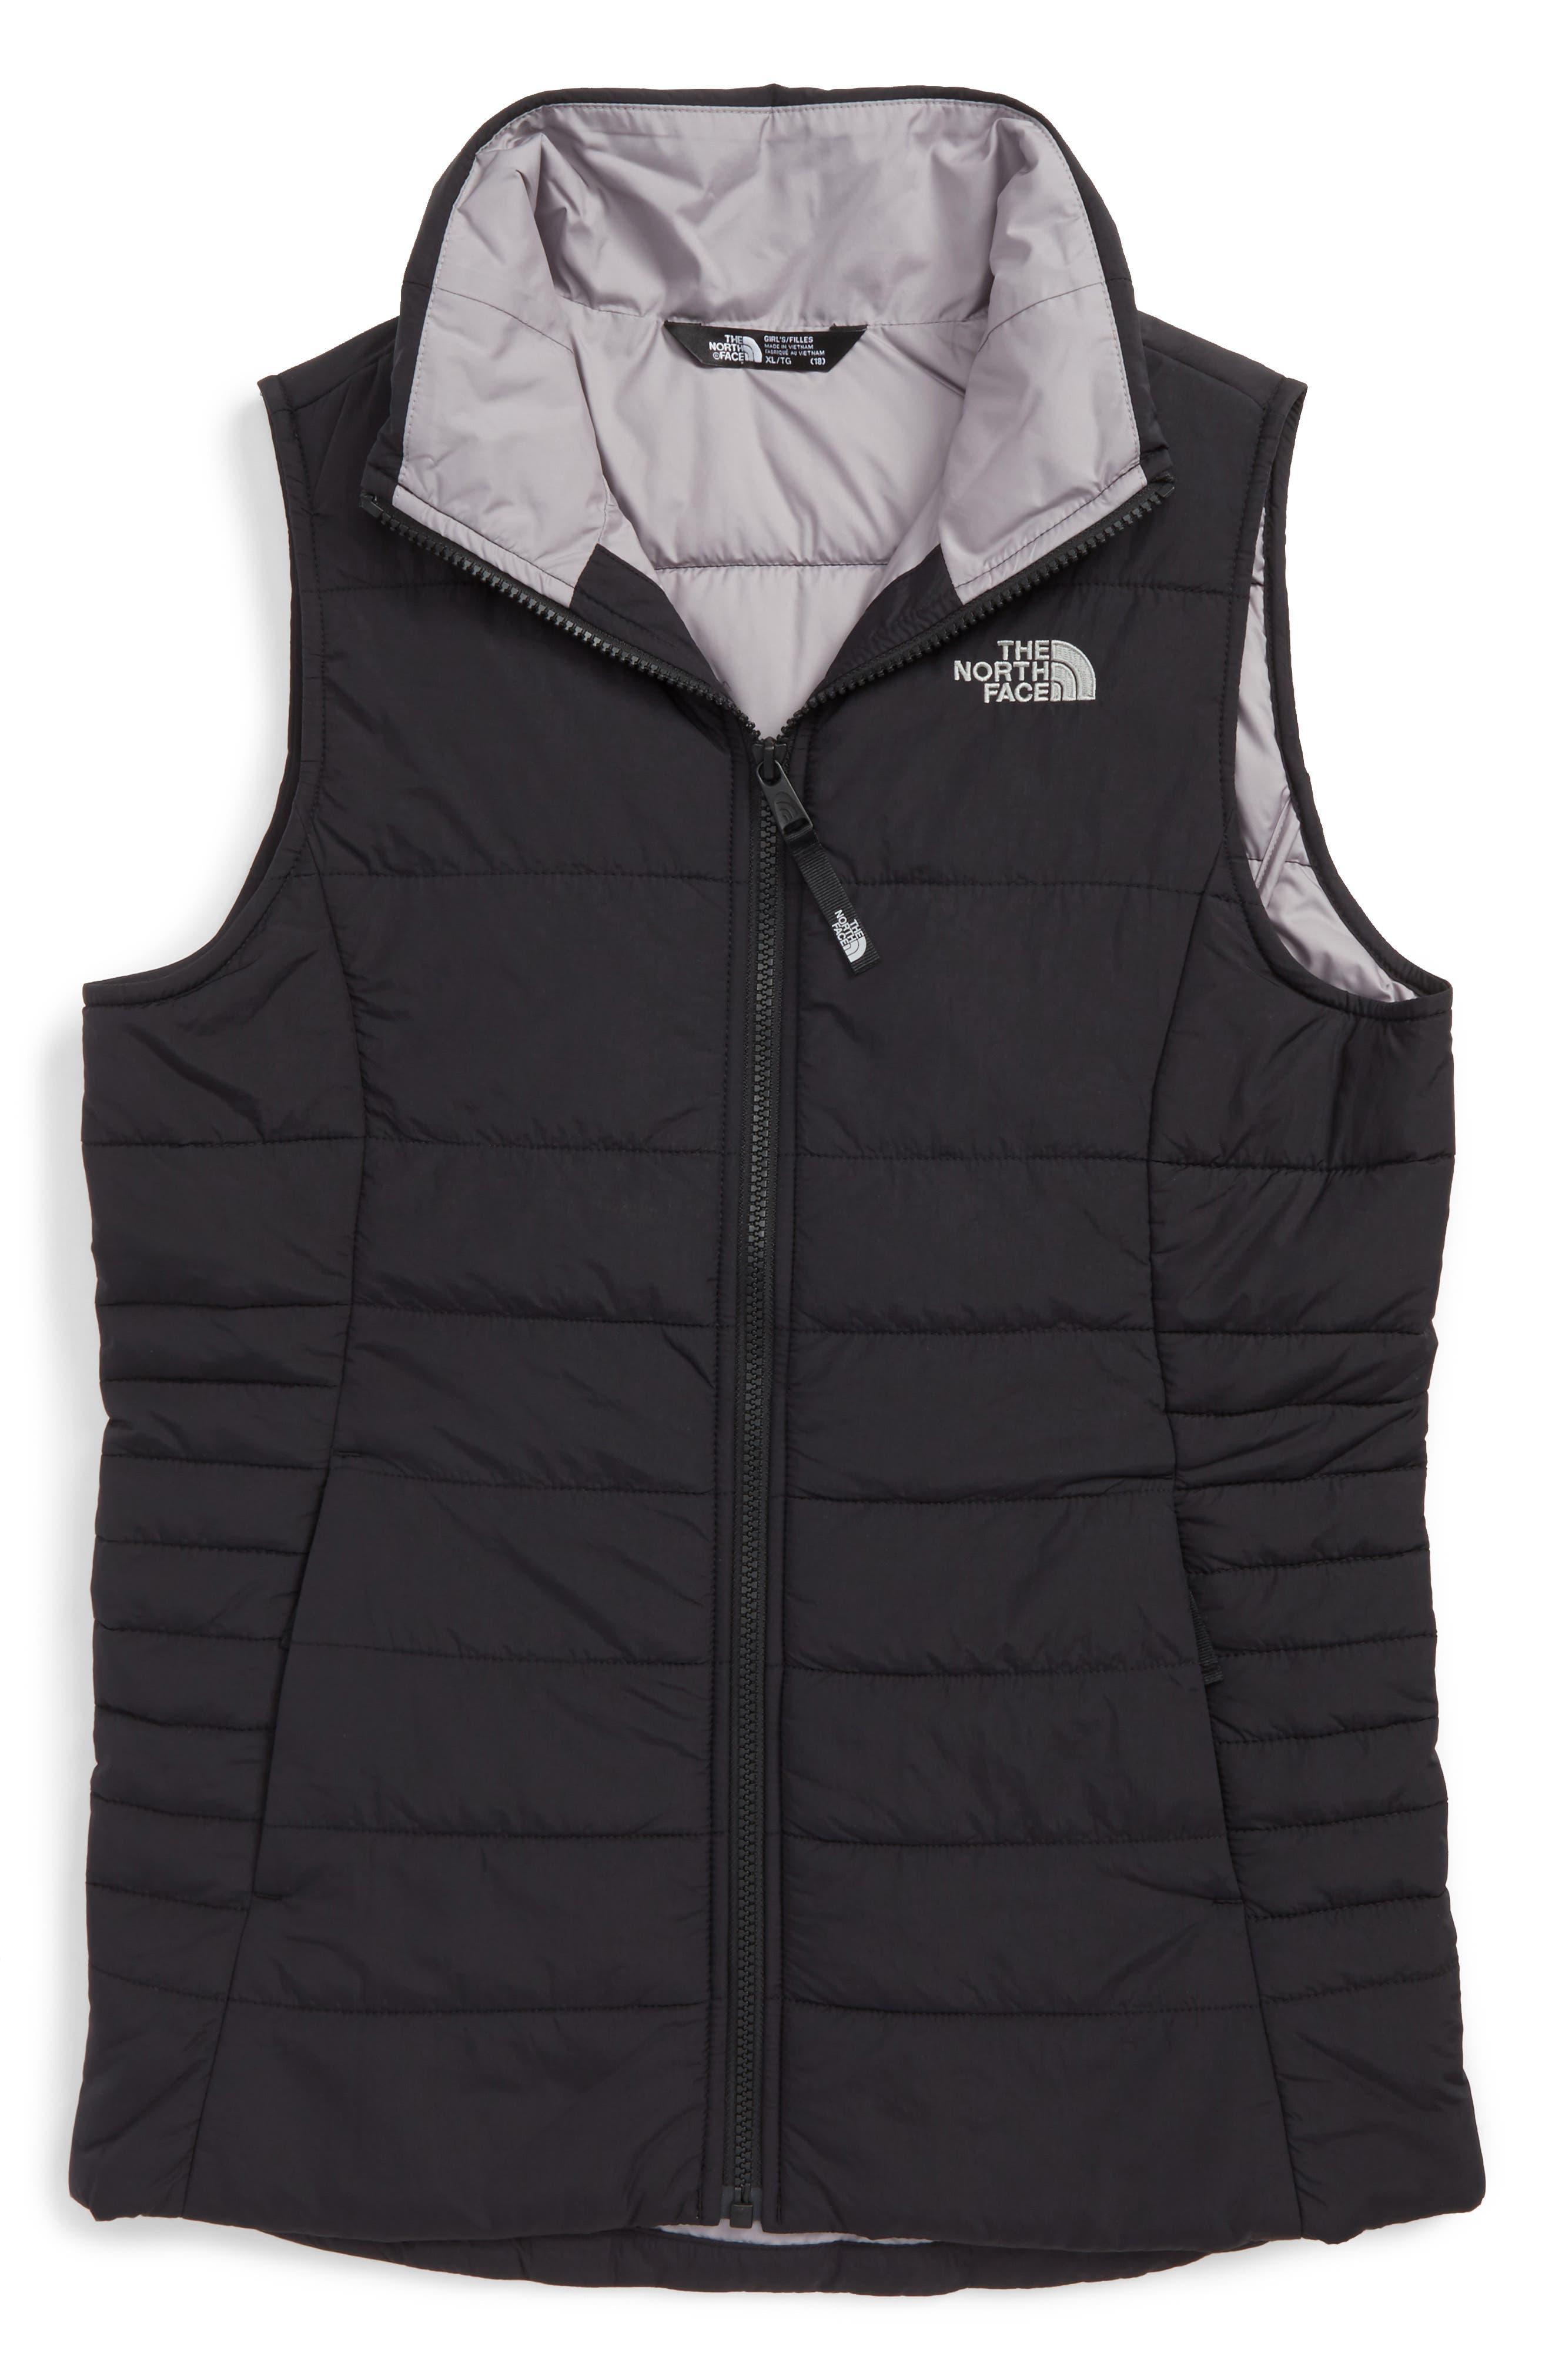 Harway Vest,                         Main,                         color, Tnf Black